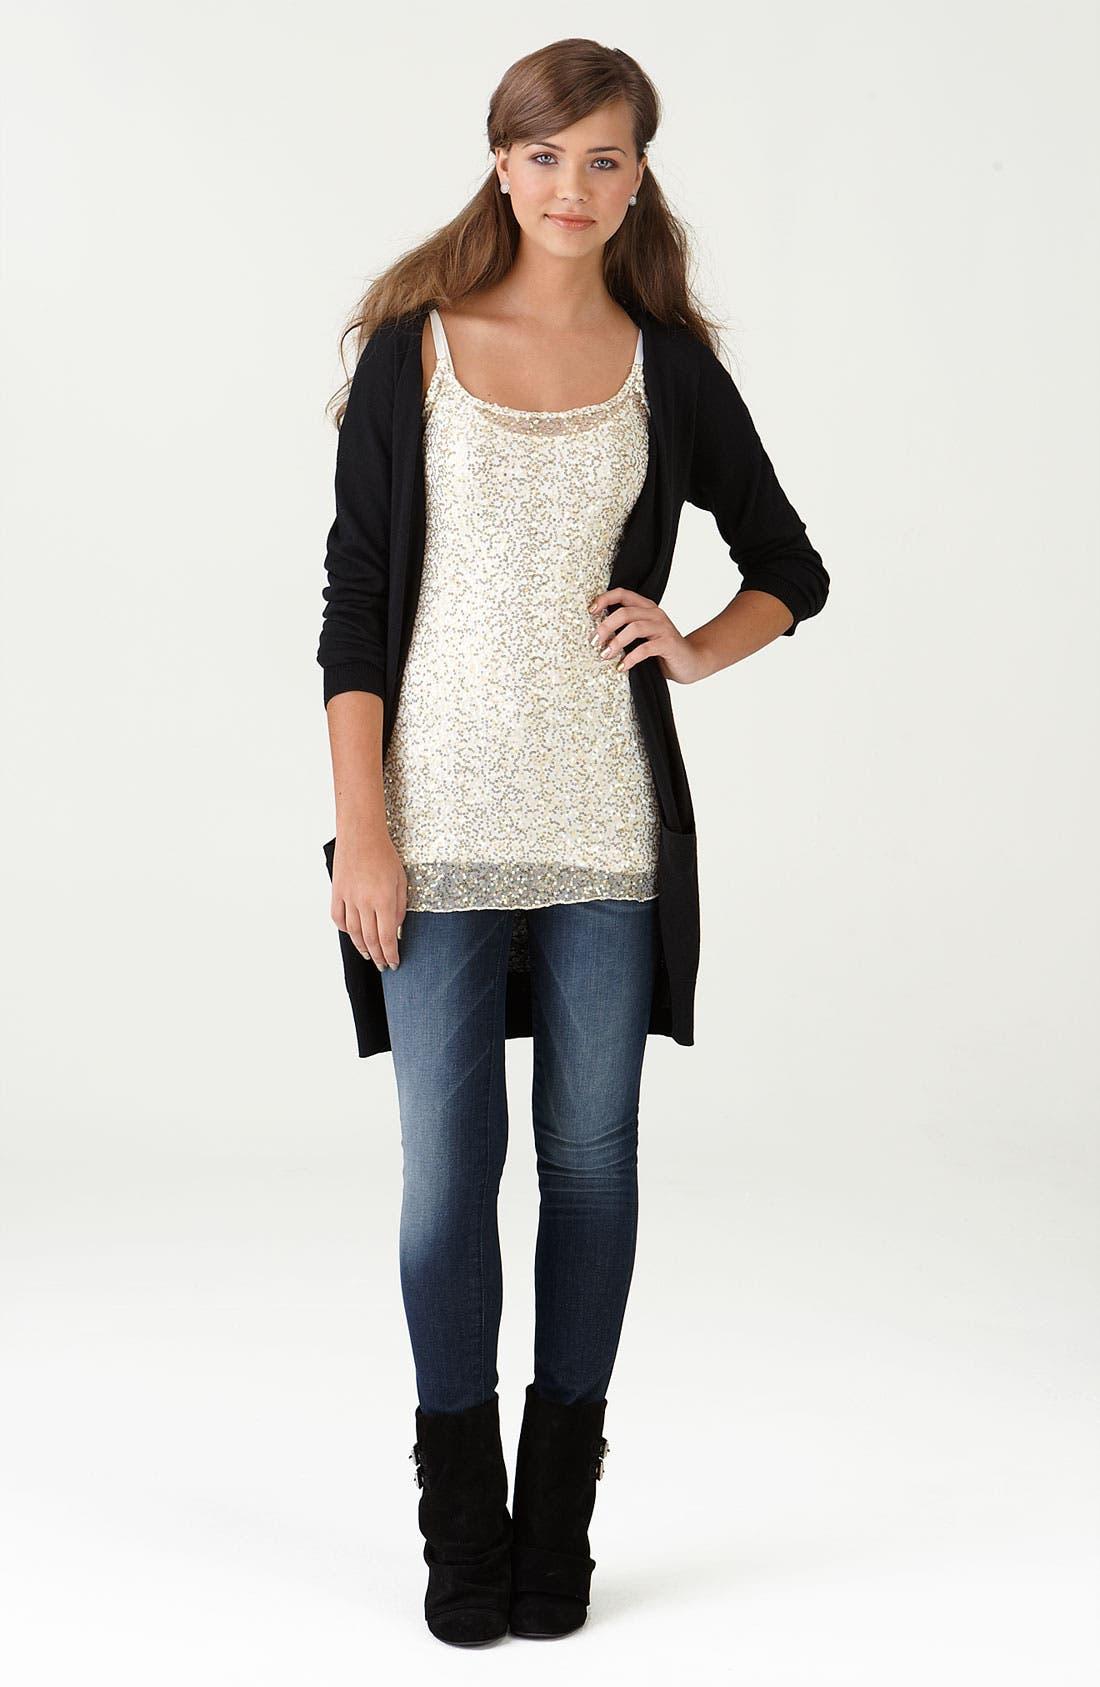 Alternate Image 1 Selected - Frenchi® Cardigan, h.i.p. Tunic & Vigoss Jeans